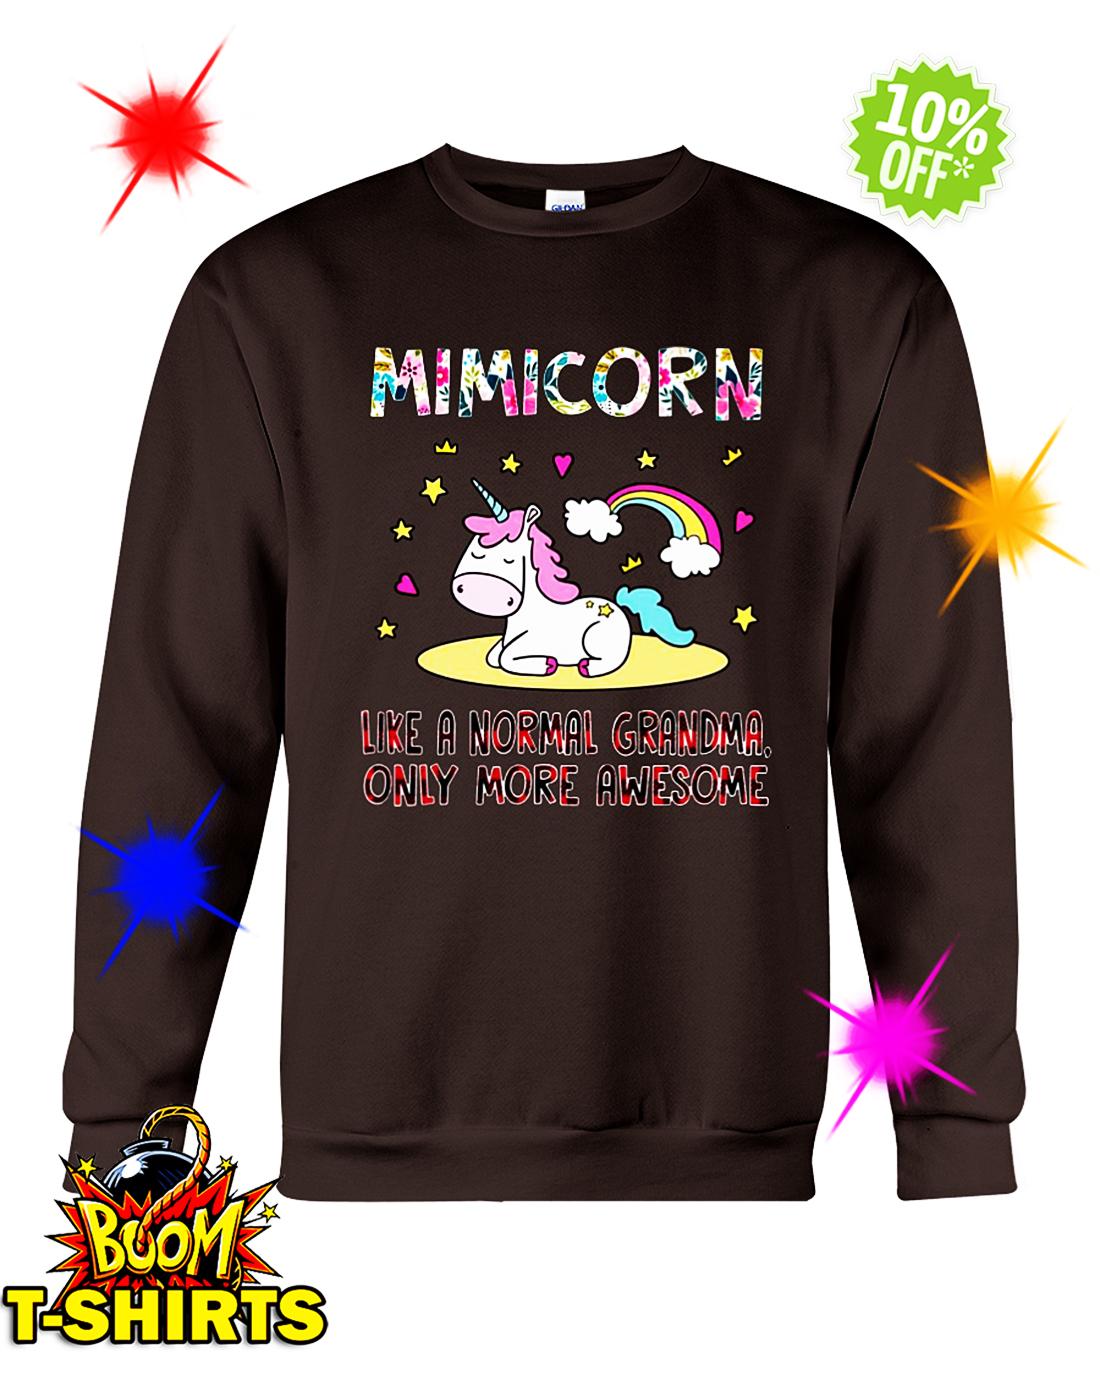 Mimicorn like a normal grandma only more awesome sweatshirt